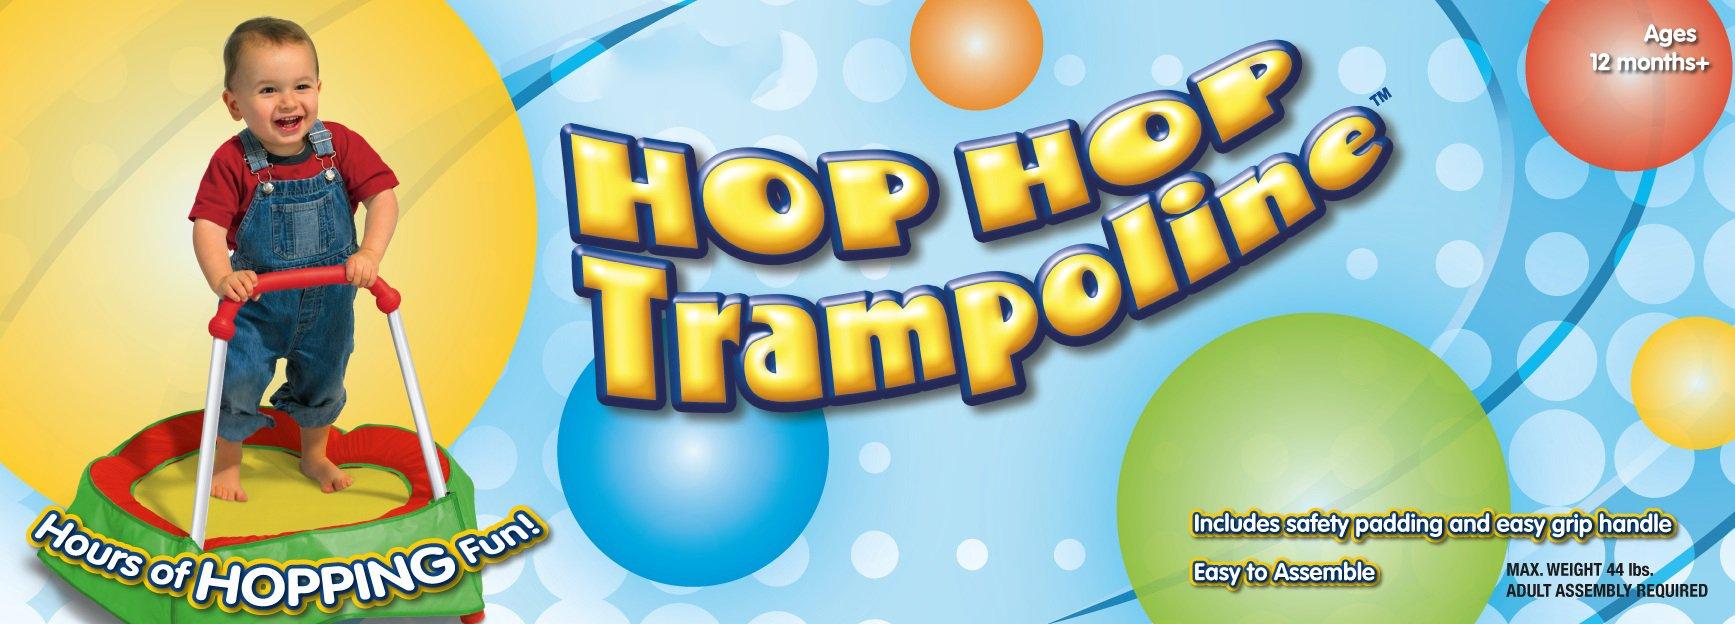 Diggin HopHop Trampoline